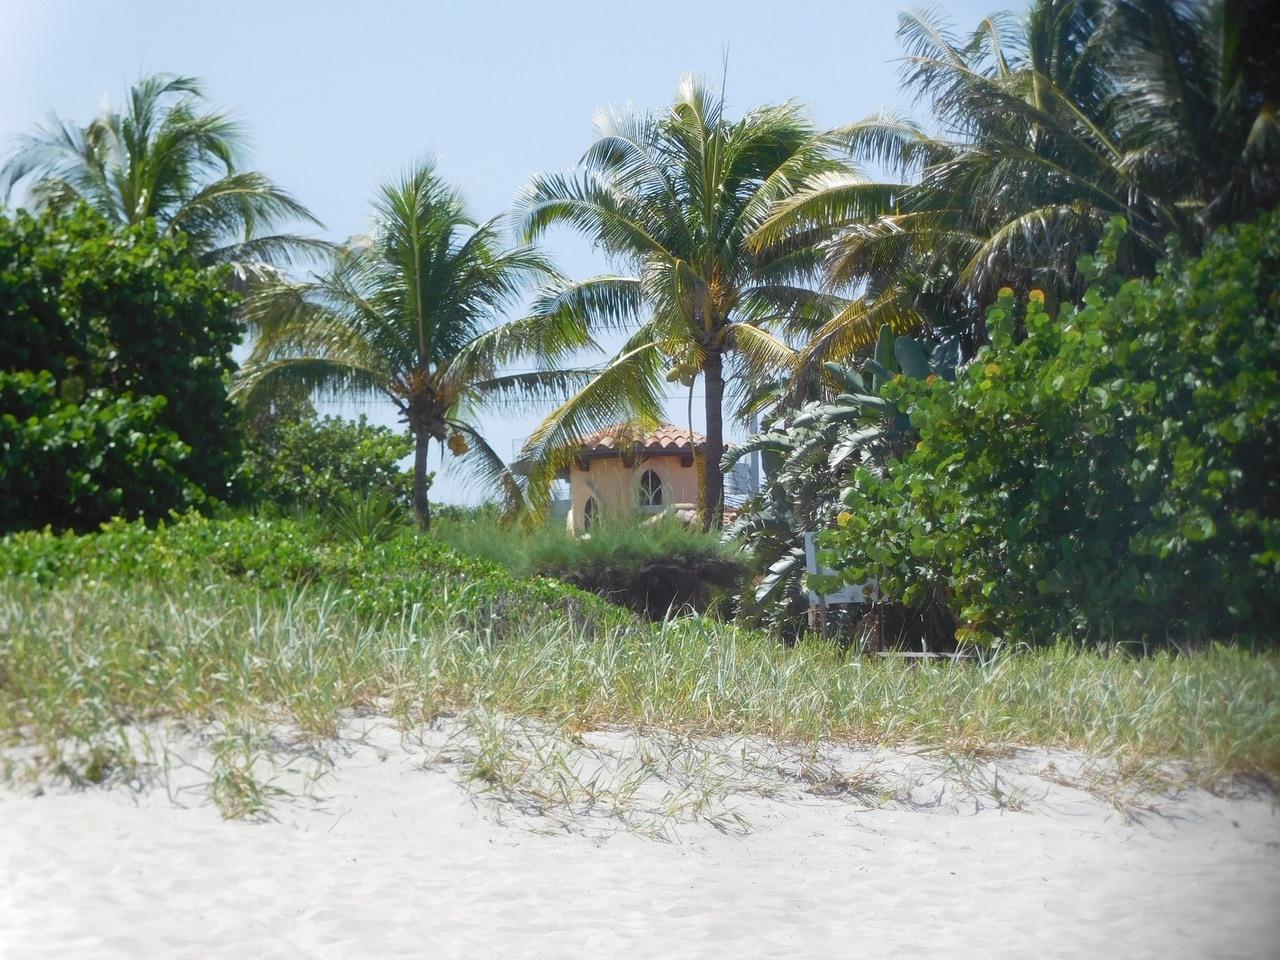 Photo of Visiter Deerfield Beach en Floride / Guide de Voyage